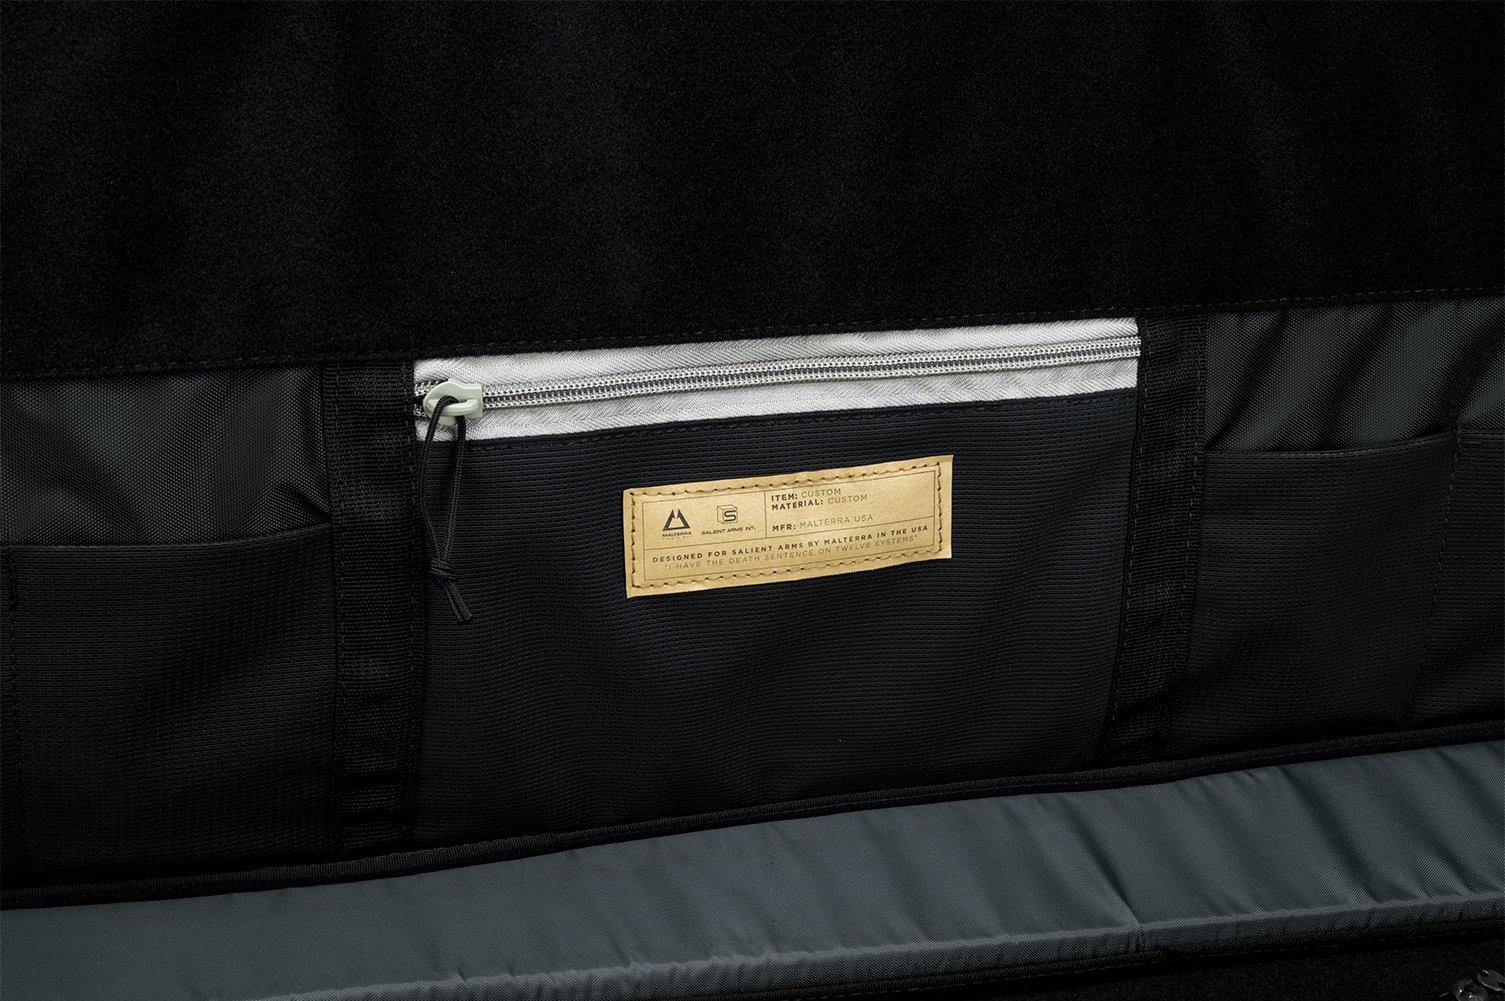 Evike Salient Arms International x Malterra Tactical Rifle Bag - Grey - (60930) by Evike (Image #6)